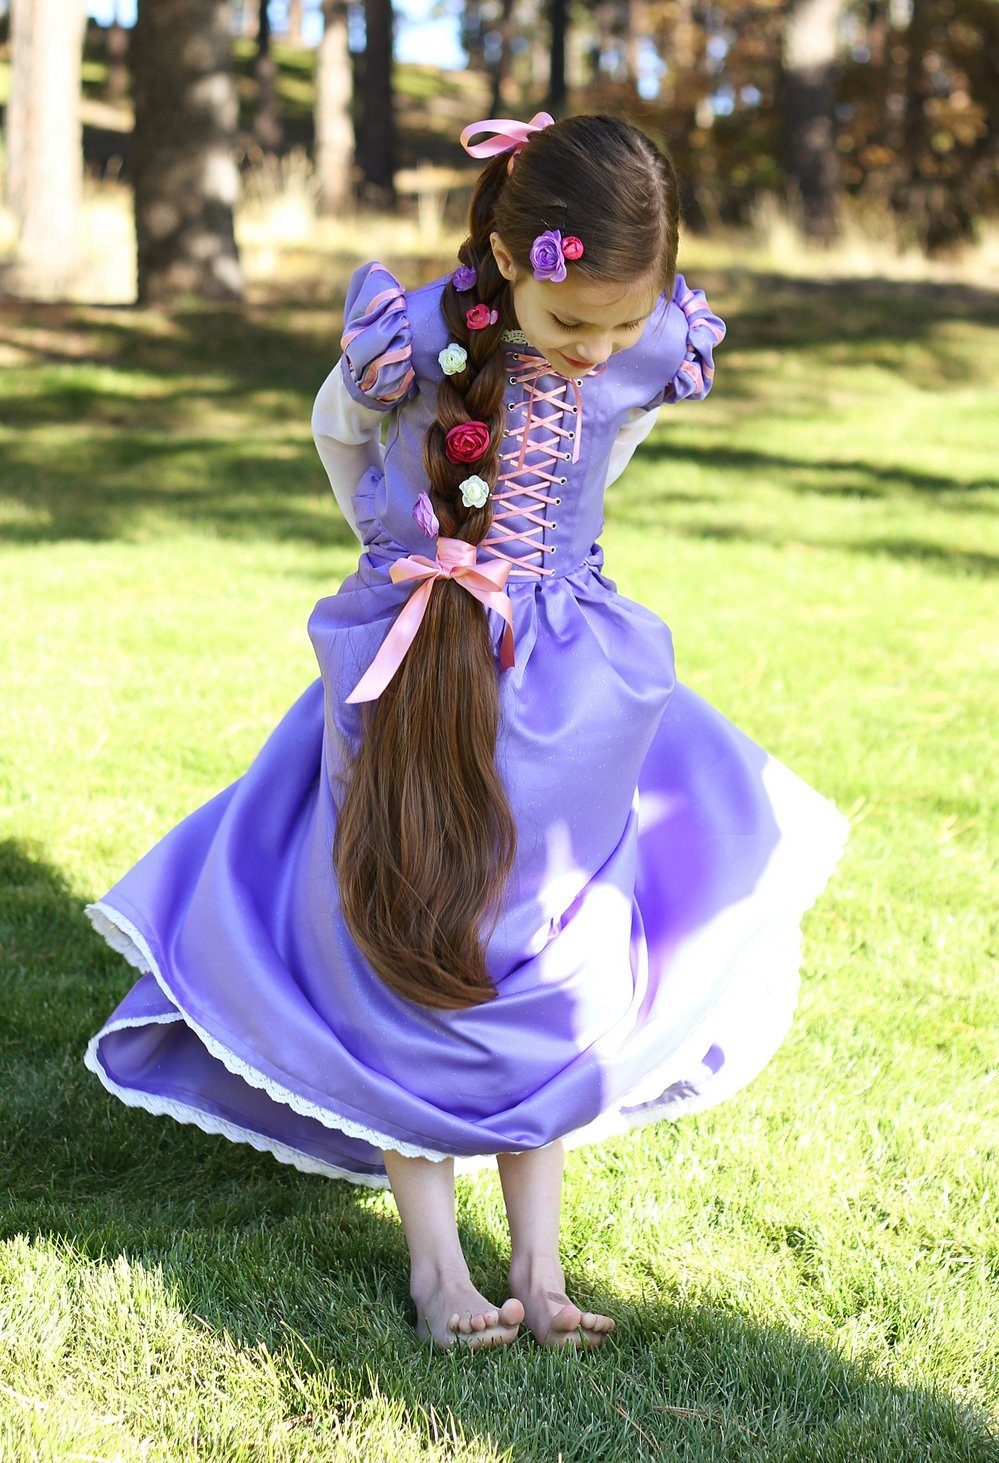 Diy rapunzel costume DIY Prettiest Princess Costume Ideas To Shine In Your Halloween Celebration